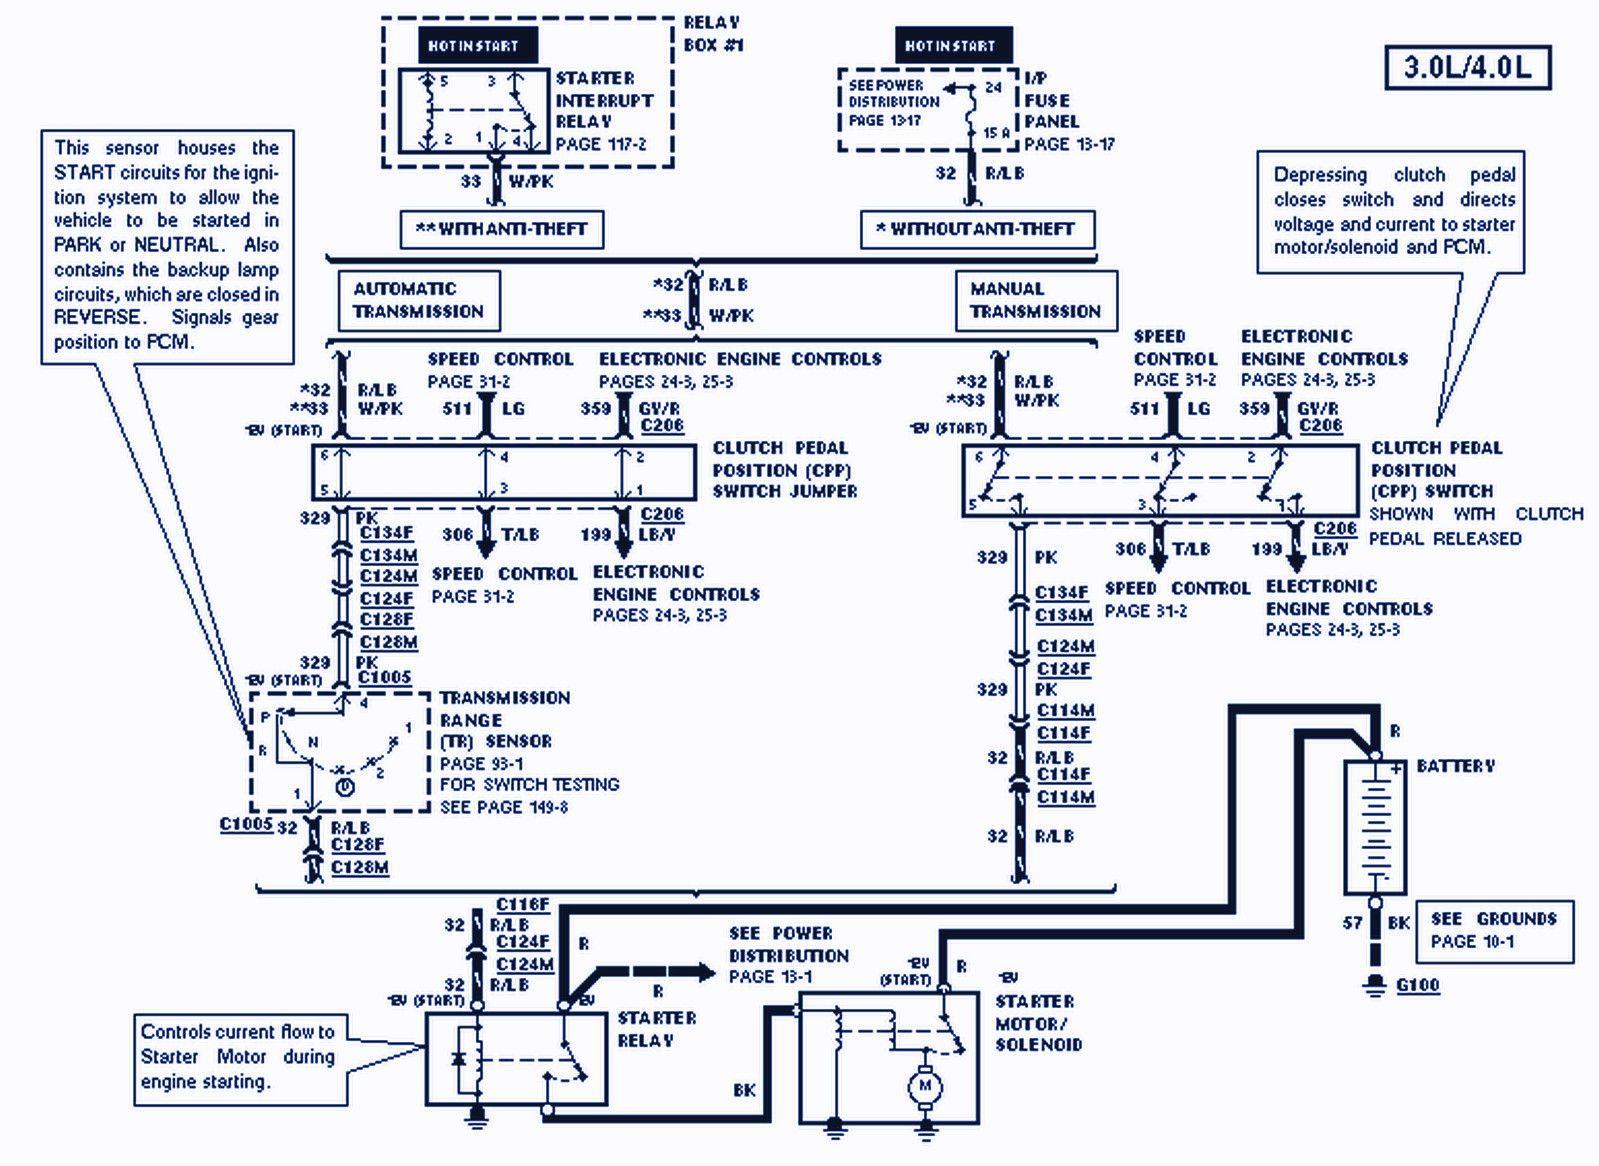 1998 ford ranger engine wiring diagram 8 2006 explorer 4 0 l ecm wiring diagram [ 1599 x 1166 Pixel ]